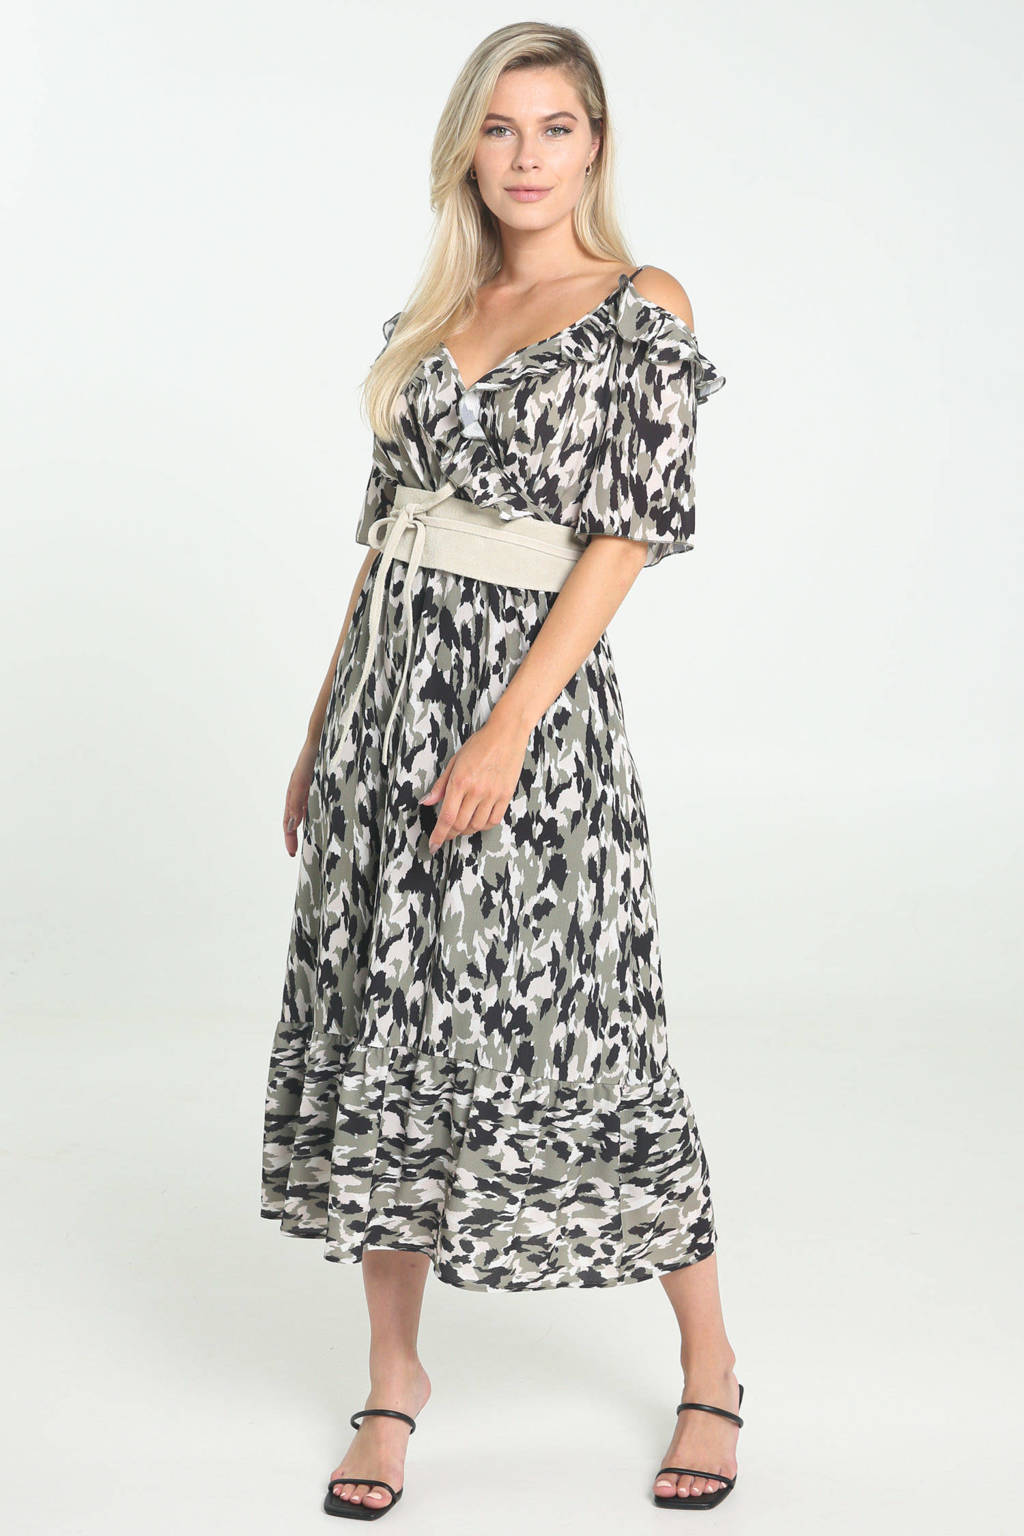 Cassis midi jurk met ruches in camouflage print donkergroen/zwart/grijs